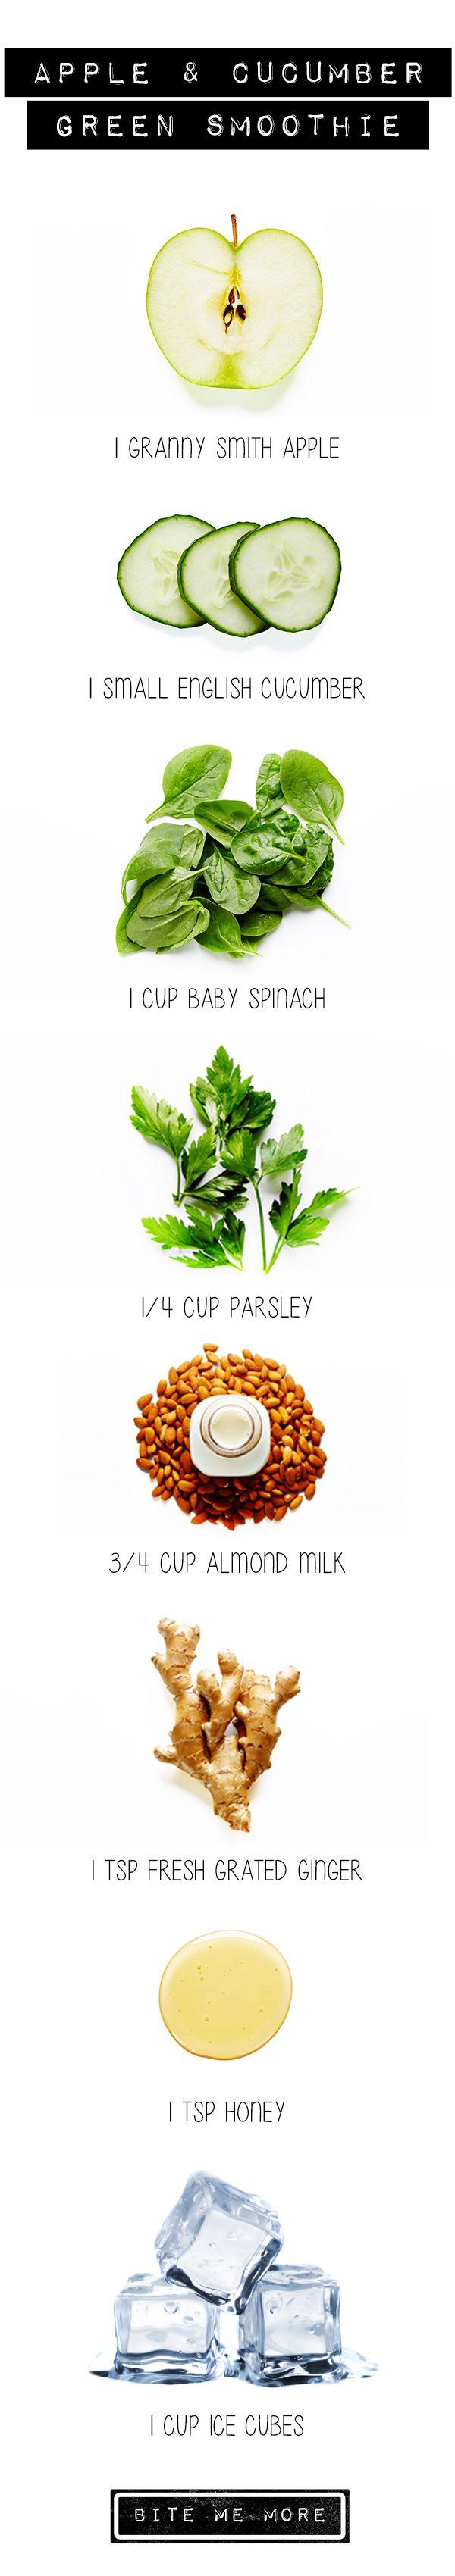 1 granny smith appel - 1 komkommer - 1 cup spinazie - 1/4 cup peterselie - 3/4 cup amandelmelk - 1 el gember - 1 el honing - 1 cup ijblokjes